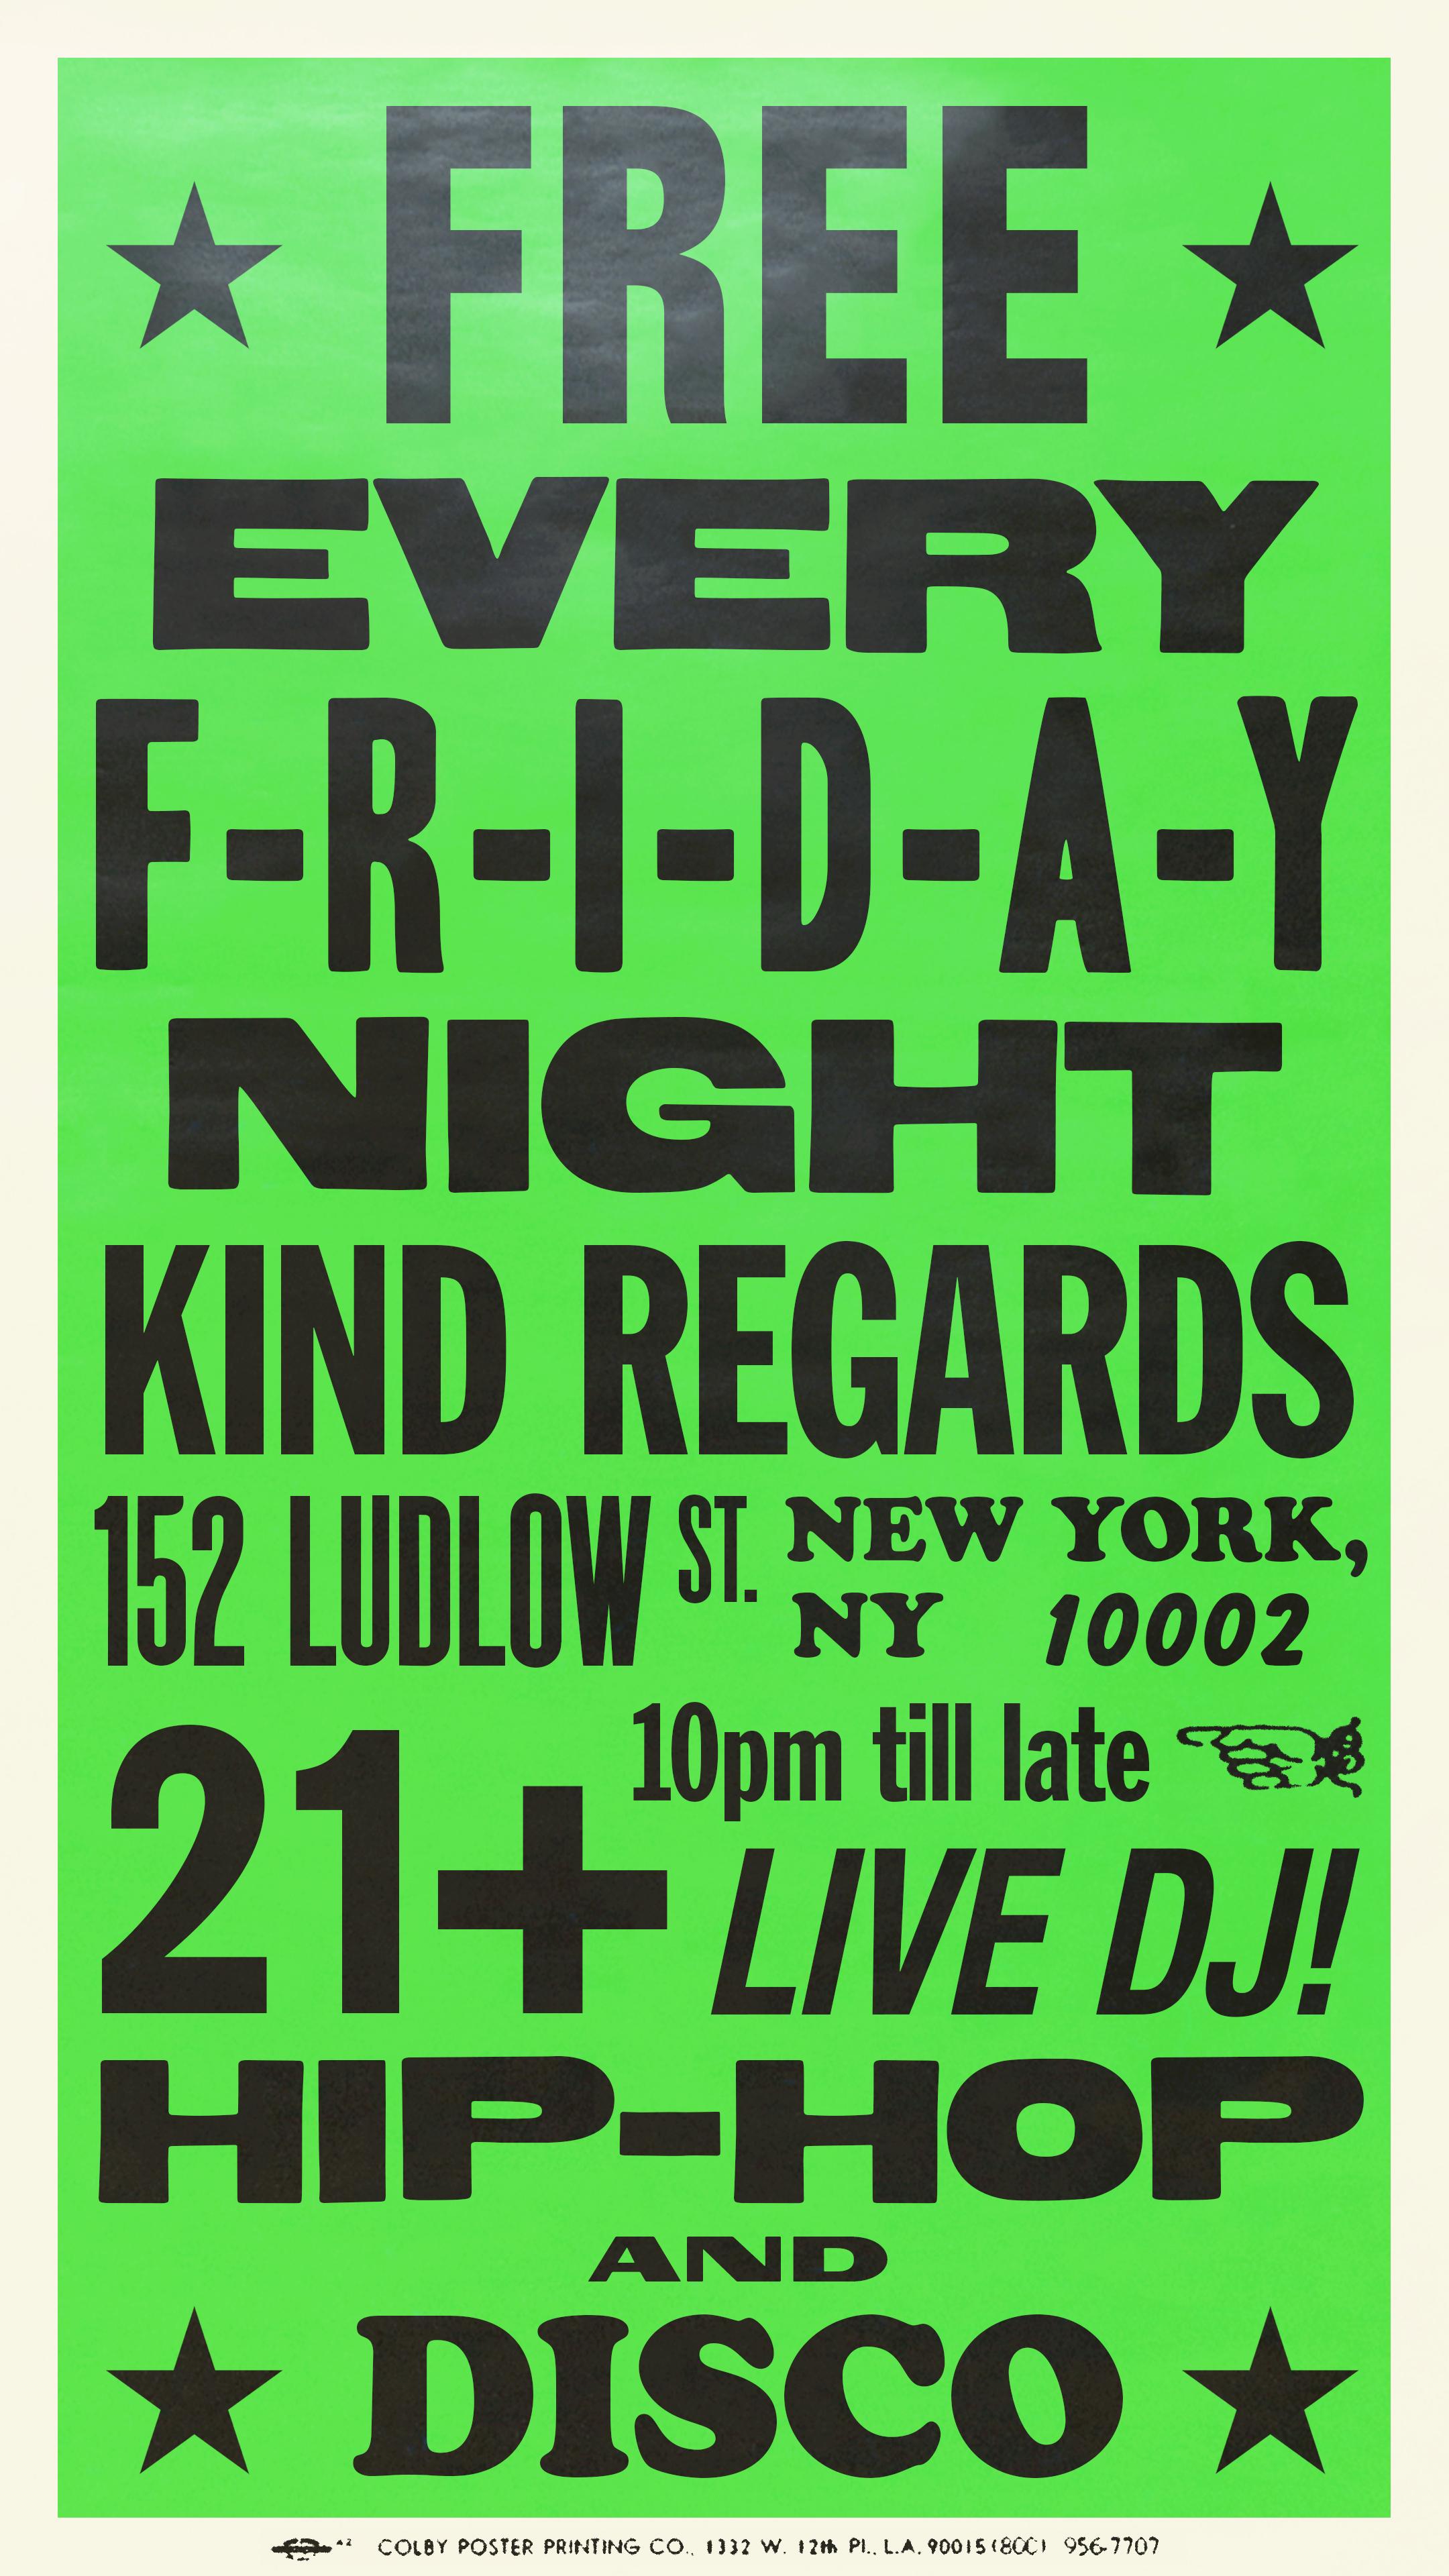 kind regards colby poster updated.jpg